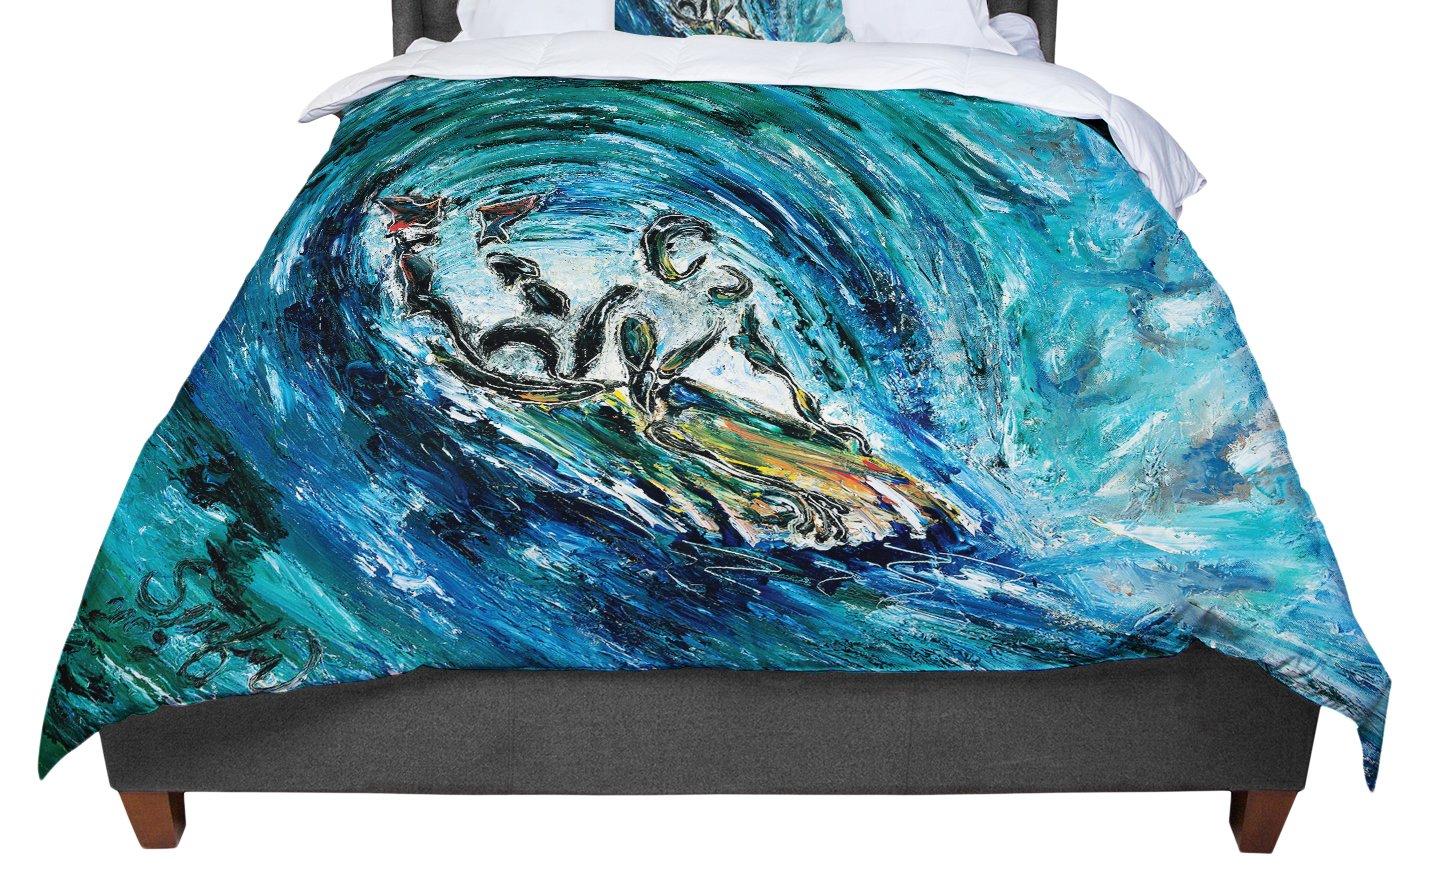 KESS InHouse Josh Serafin 'Sponge' Blue Teal Twin Comforter, 68' X 88'